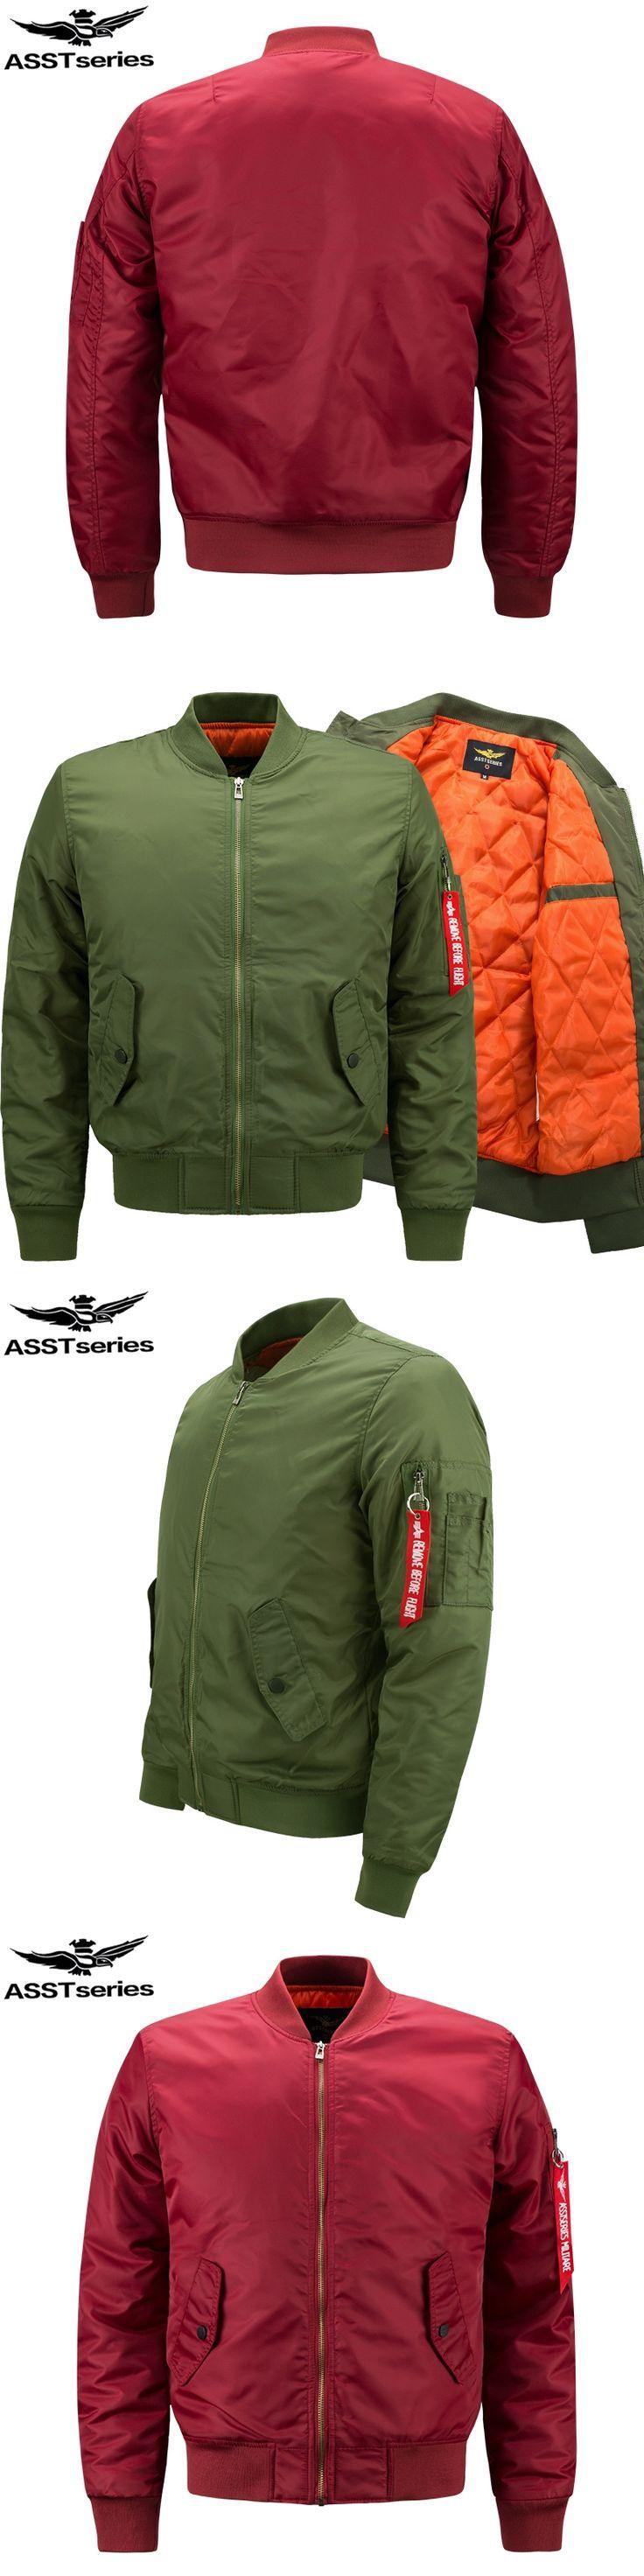 Winter Bomber Jacket Men Army Military Jacket Men Mens Jackets And Coats Plus Size 8XL Jacket For Men Chaqueta Hombre Veste.DA65